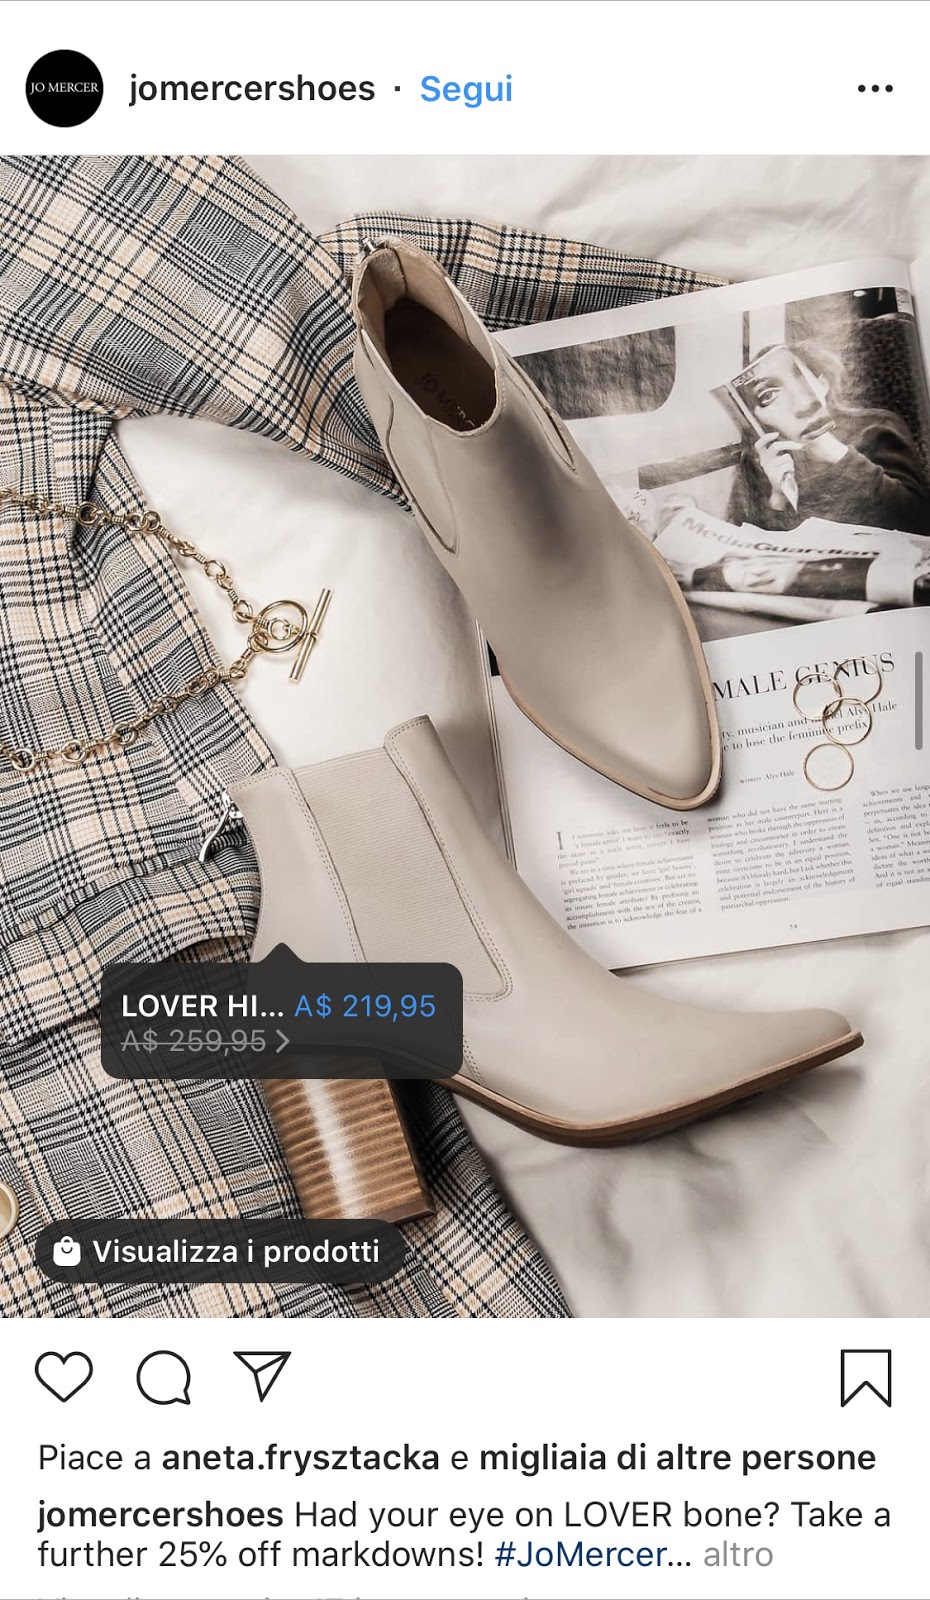 Instagram ads: shopping